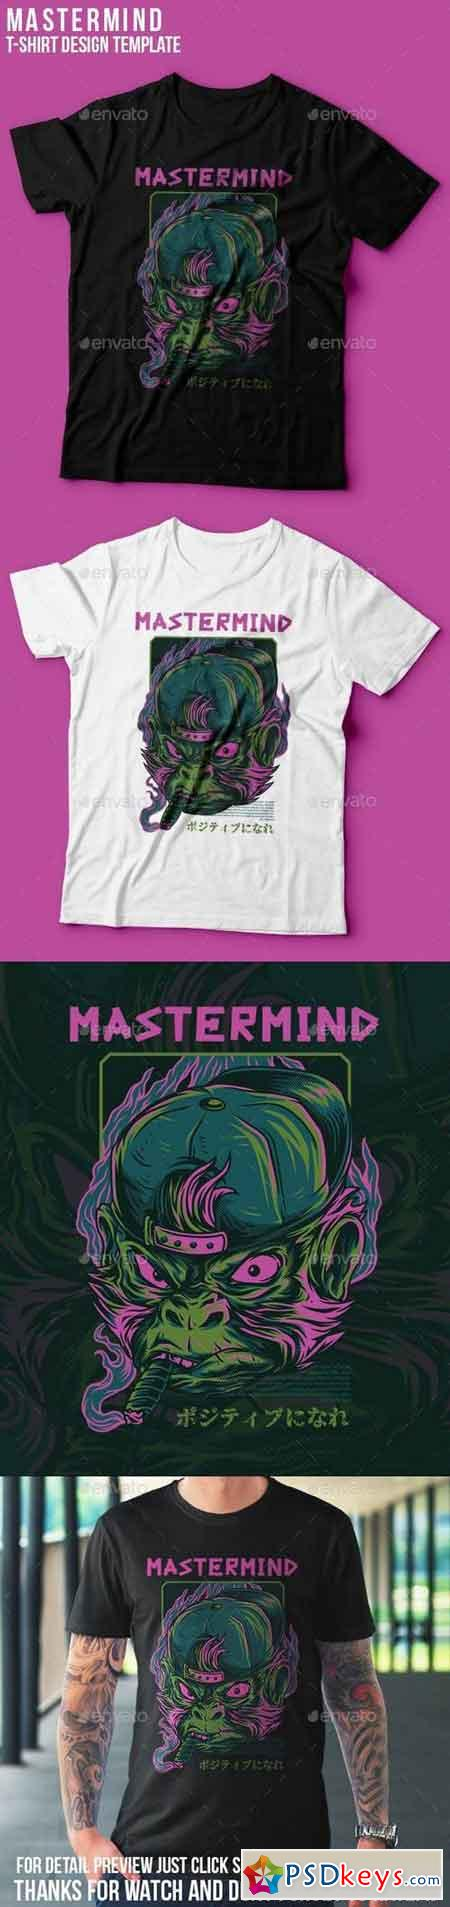 Mastermind Monkey T-Shirt Design 23109828